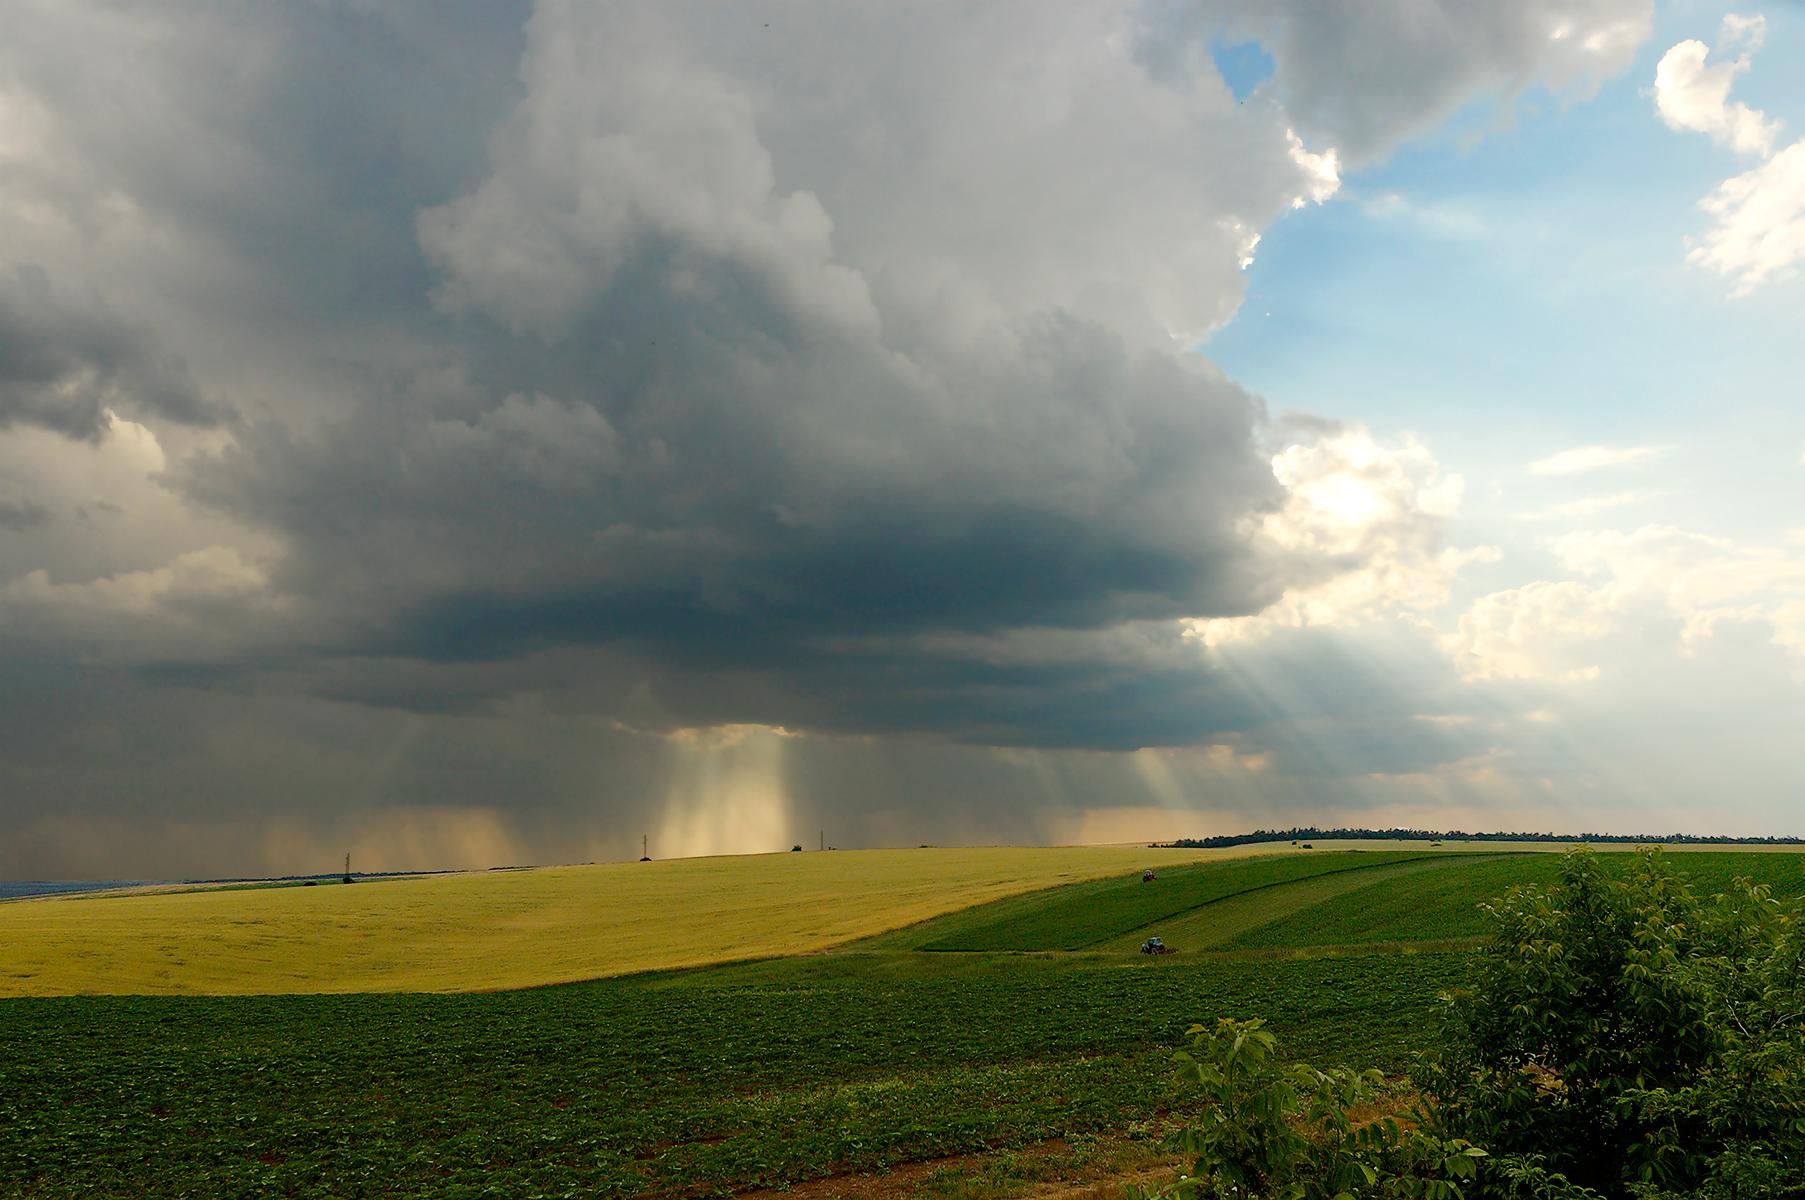 Tempest photo